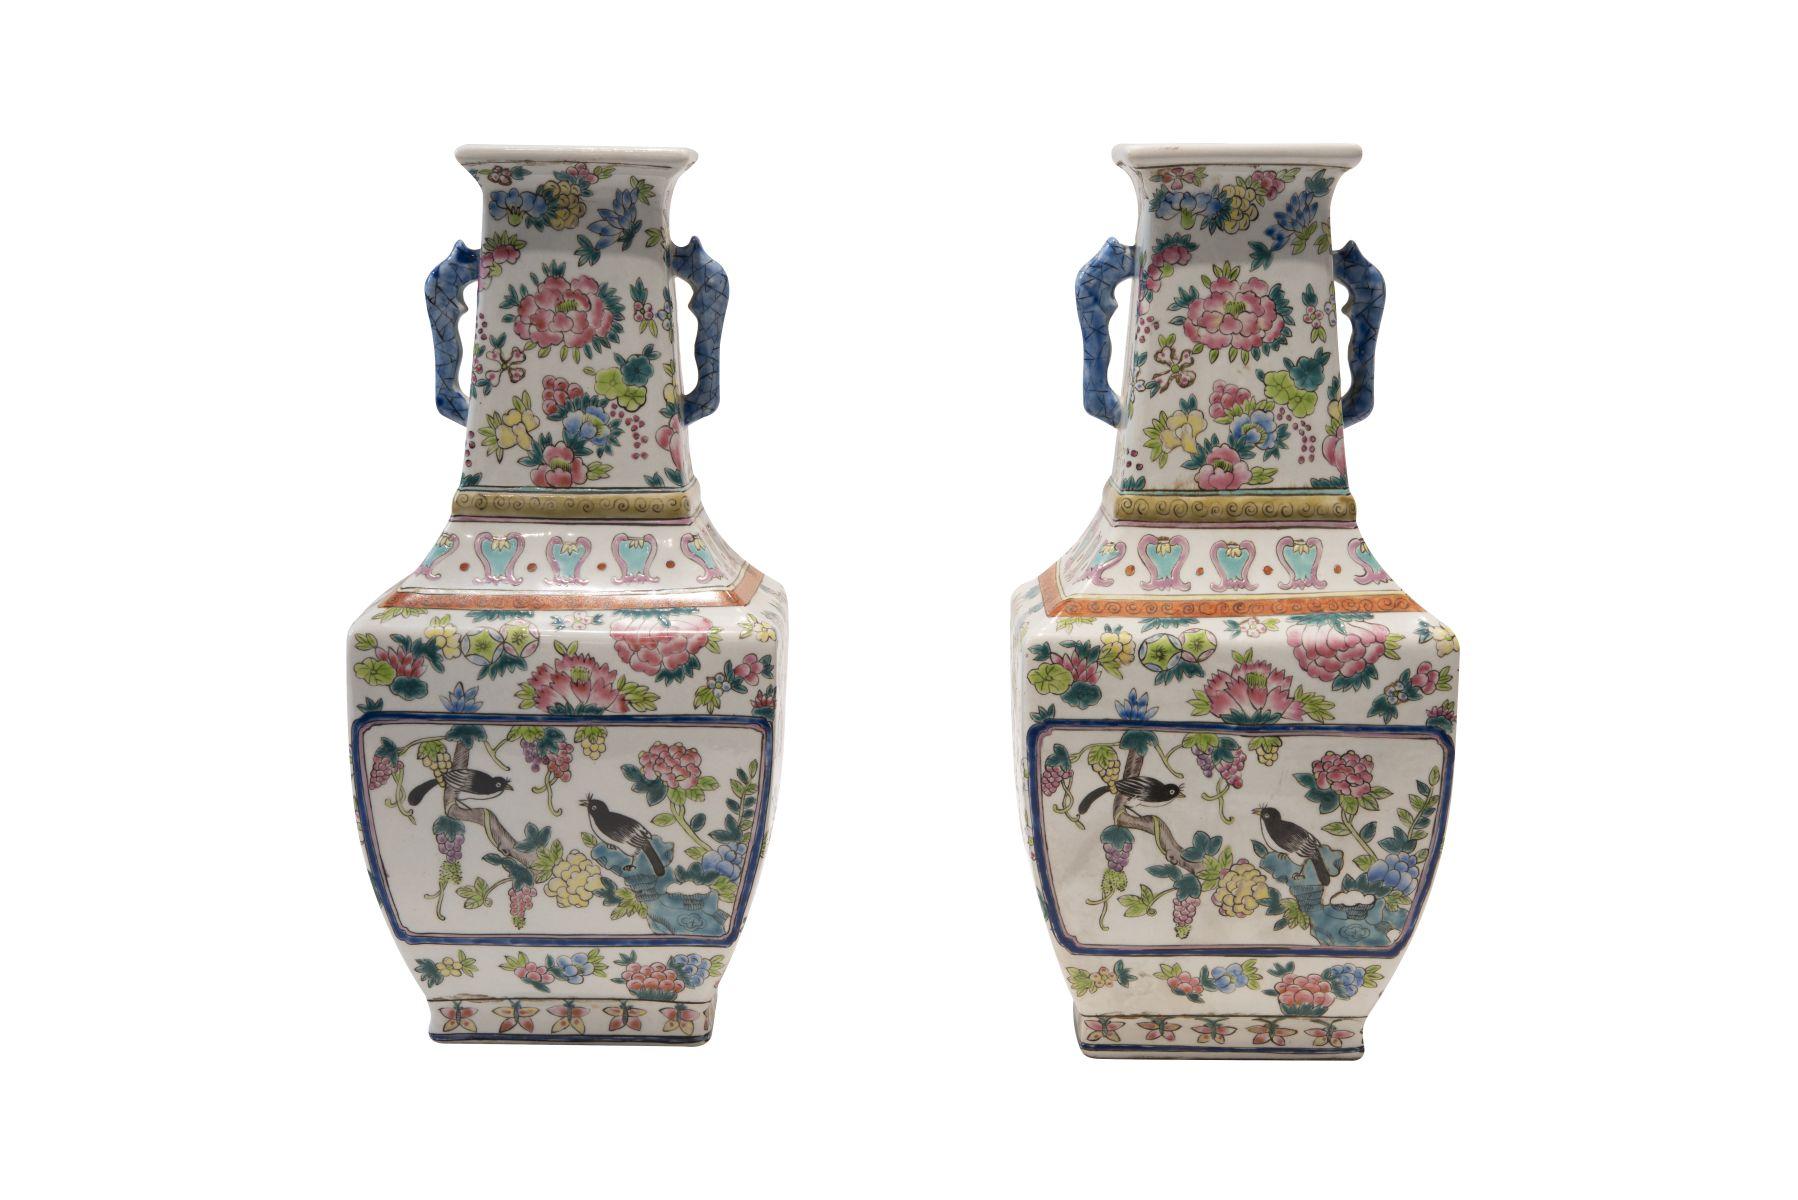 #182 2 Famille rose vases with handles | 2 Famille rose Vasen mit Henkeln Image